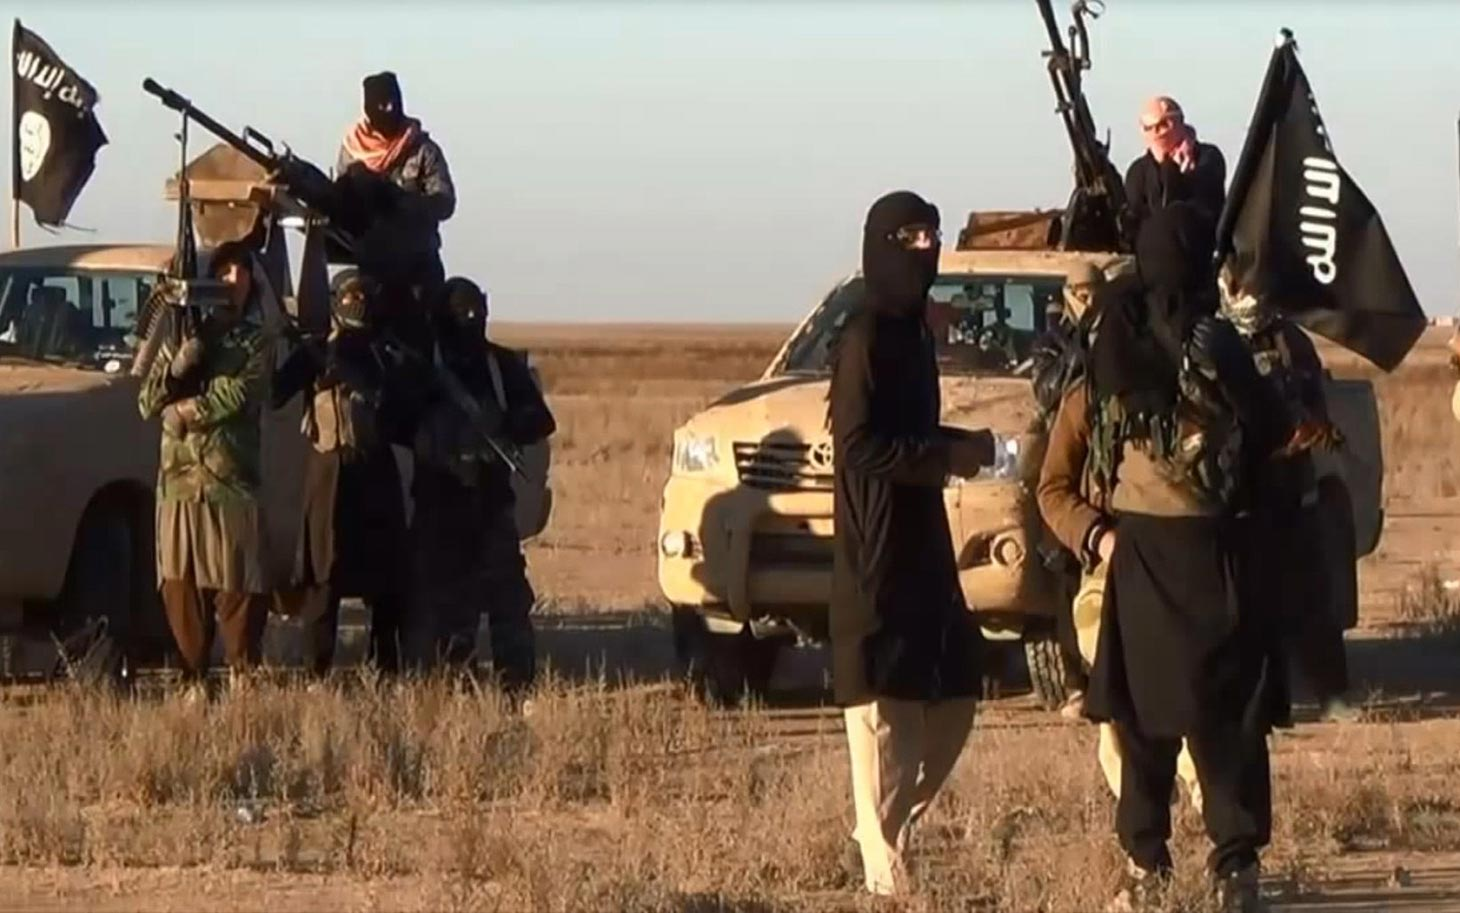 IŞİD Irak'ta iki bölgeye saldırdı